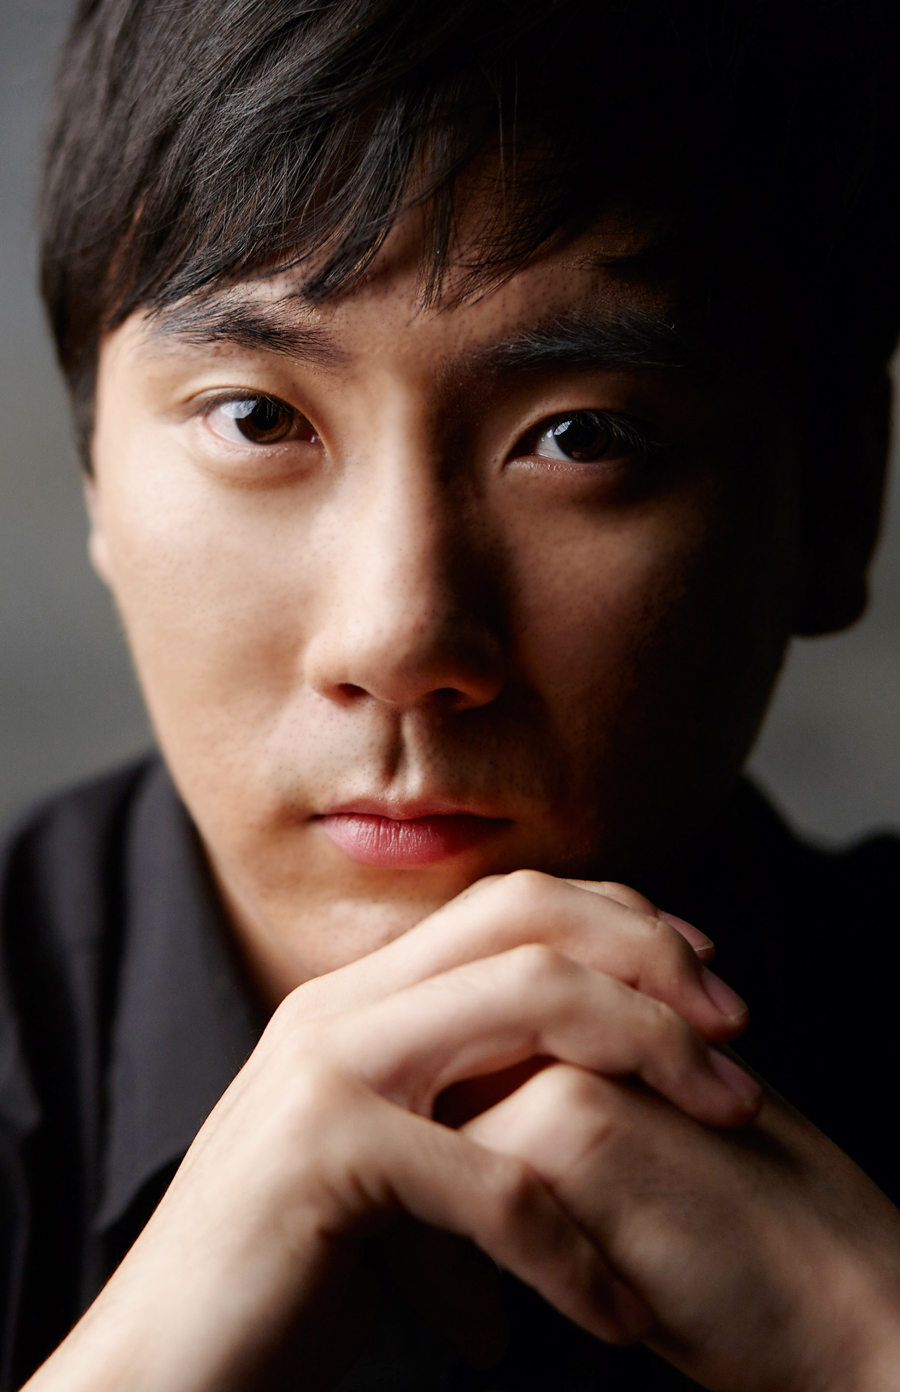 by Taewook Kang